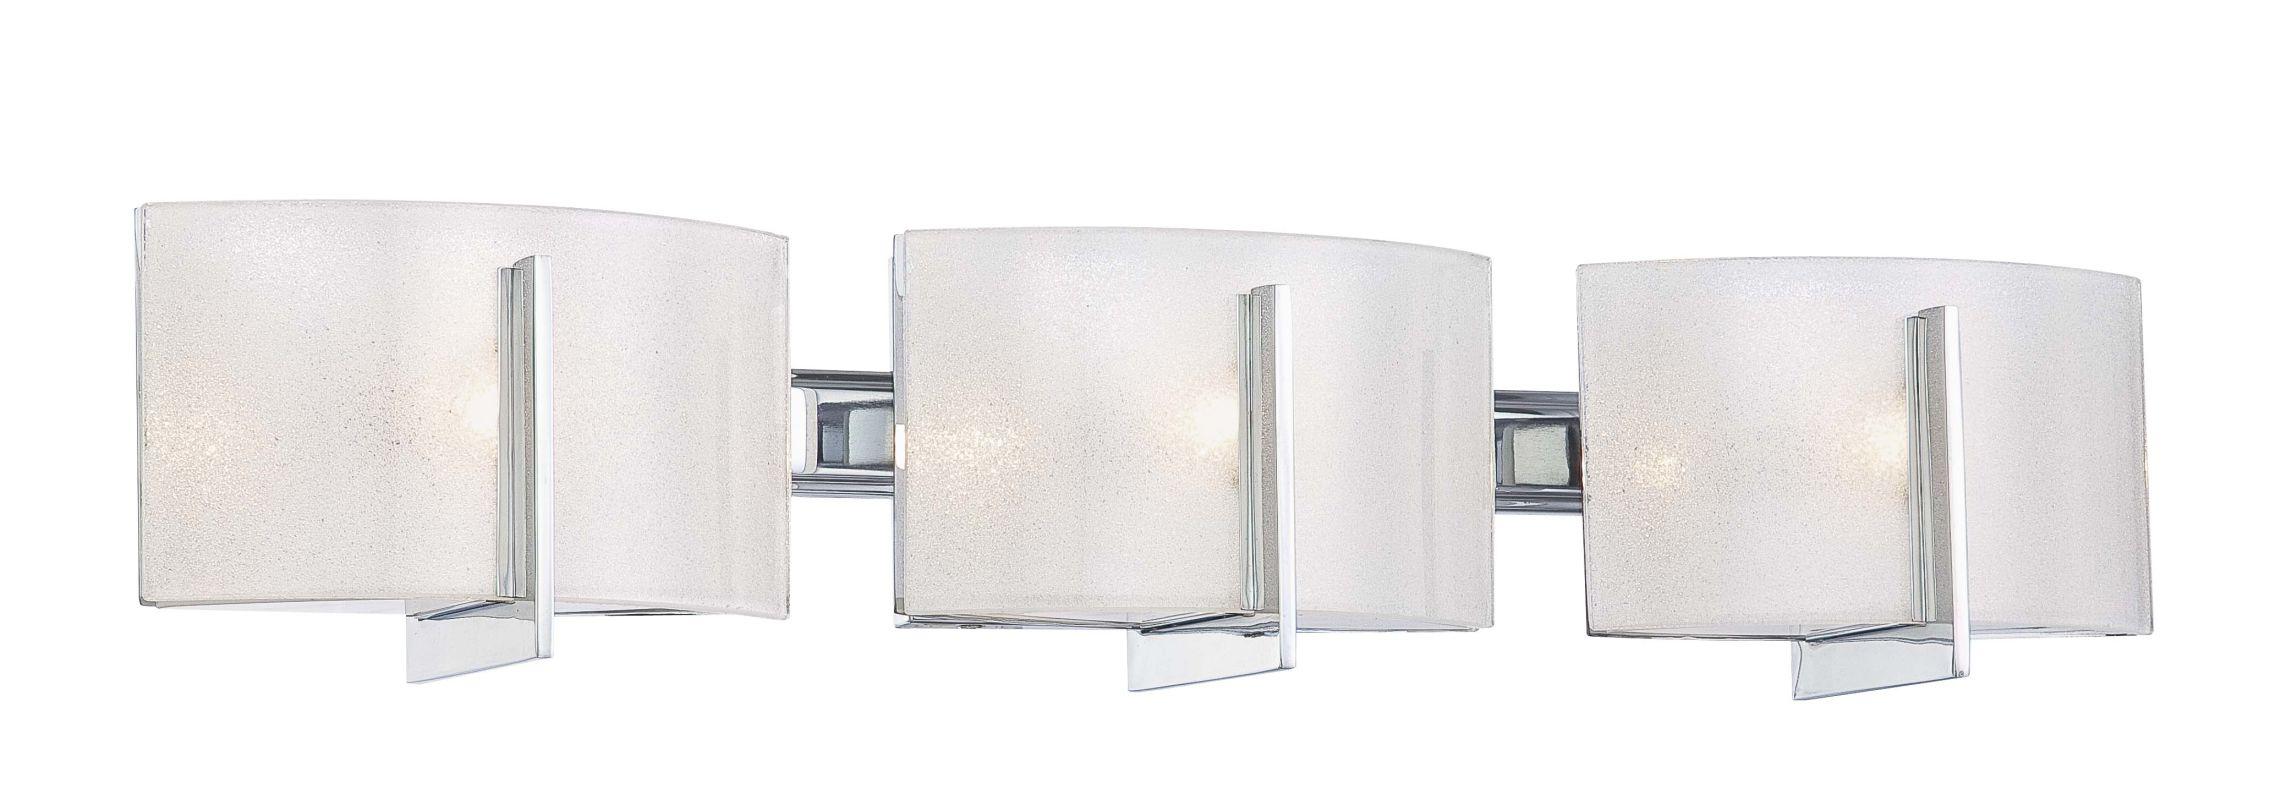 Hampton Bay Dakota Collection 3 Light Bathroom Vanity: Minka Lavery 6393-77 Chrome 3 Light Bathroom Vanity Light